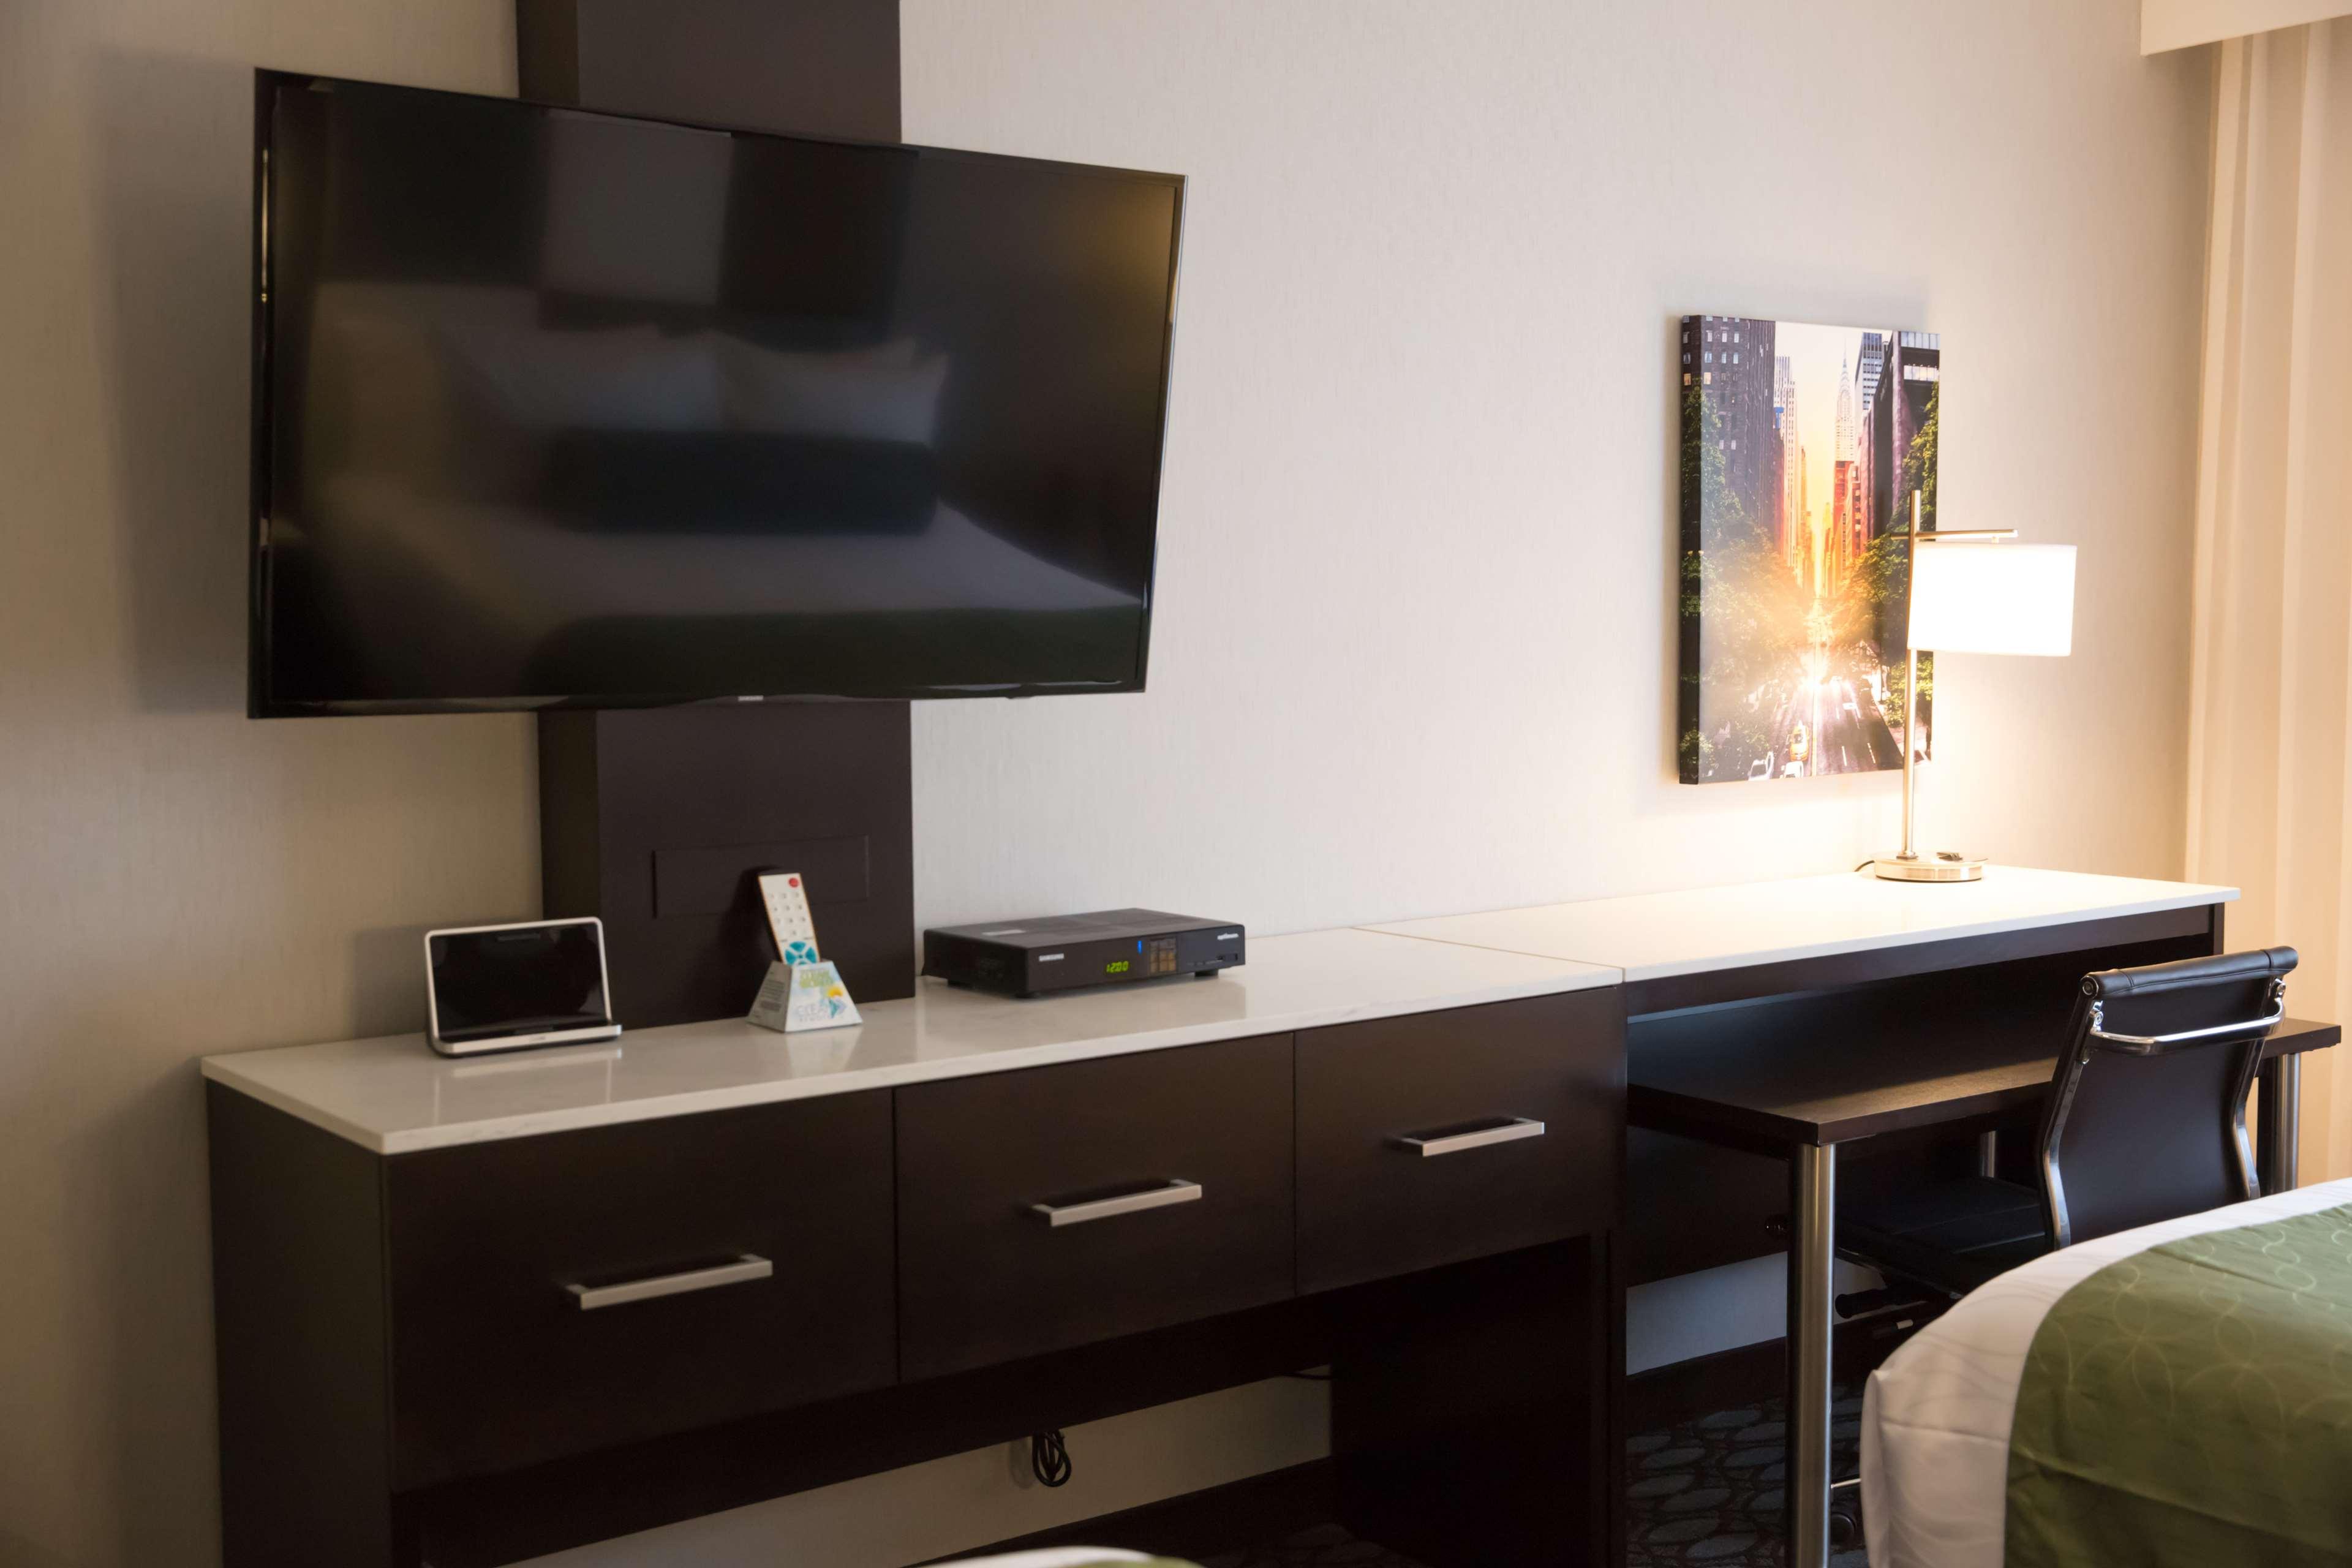 Best Western Premier NYC Gateway Hotel image 37